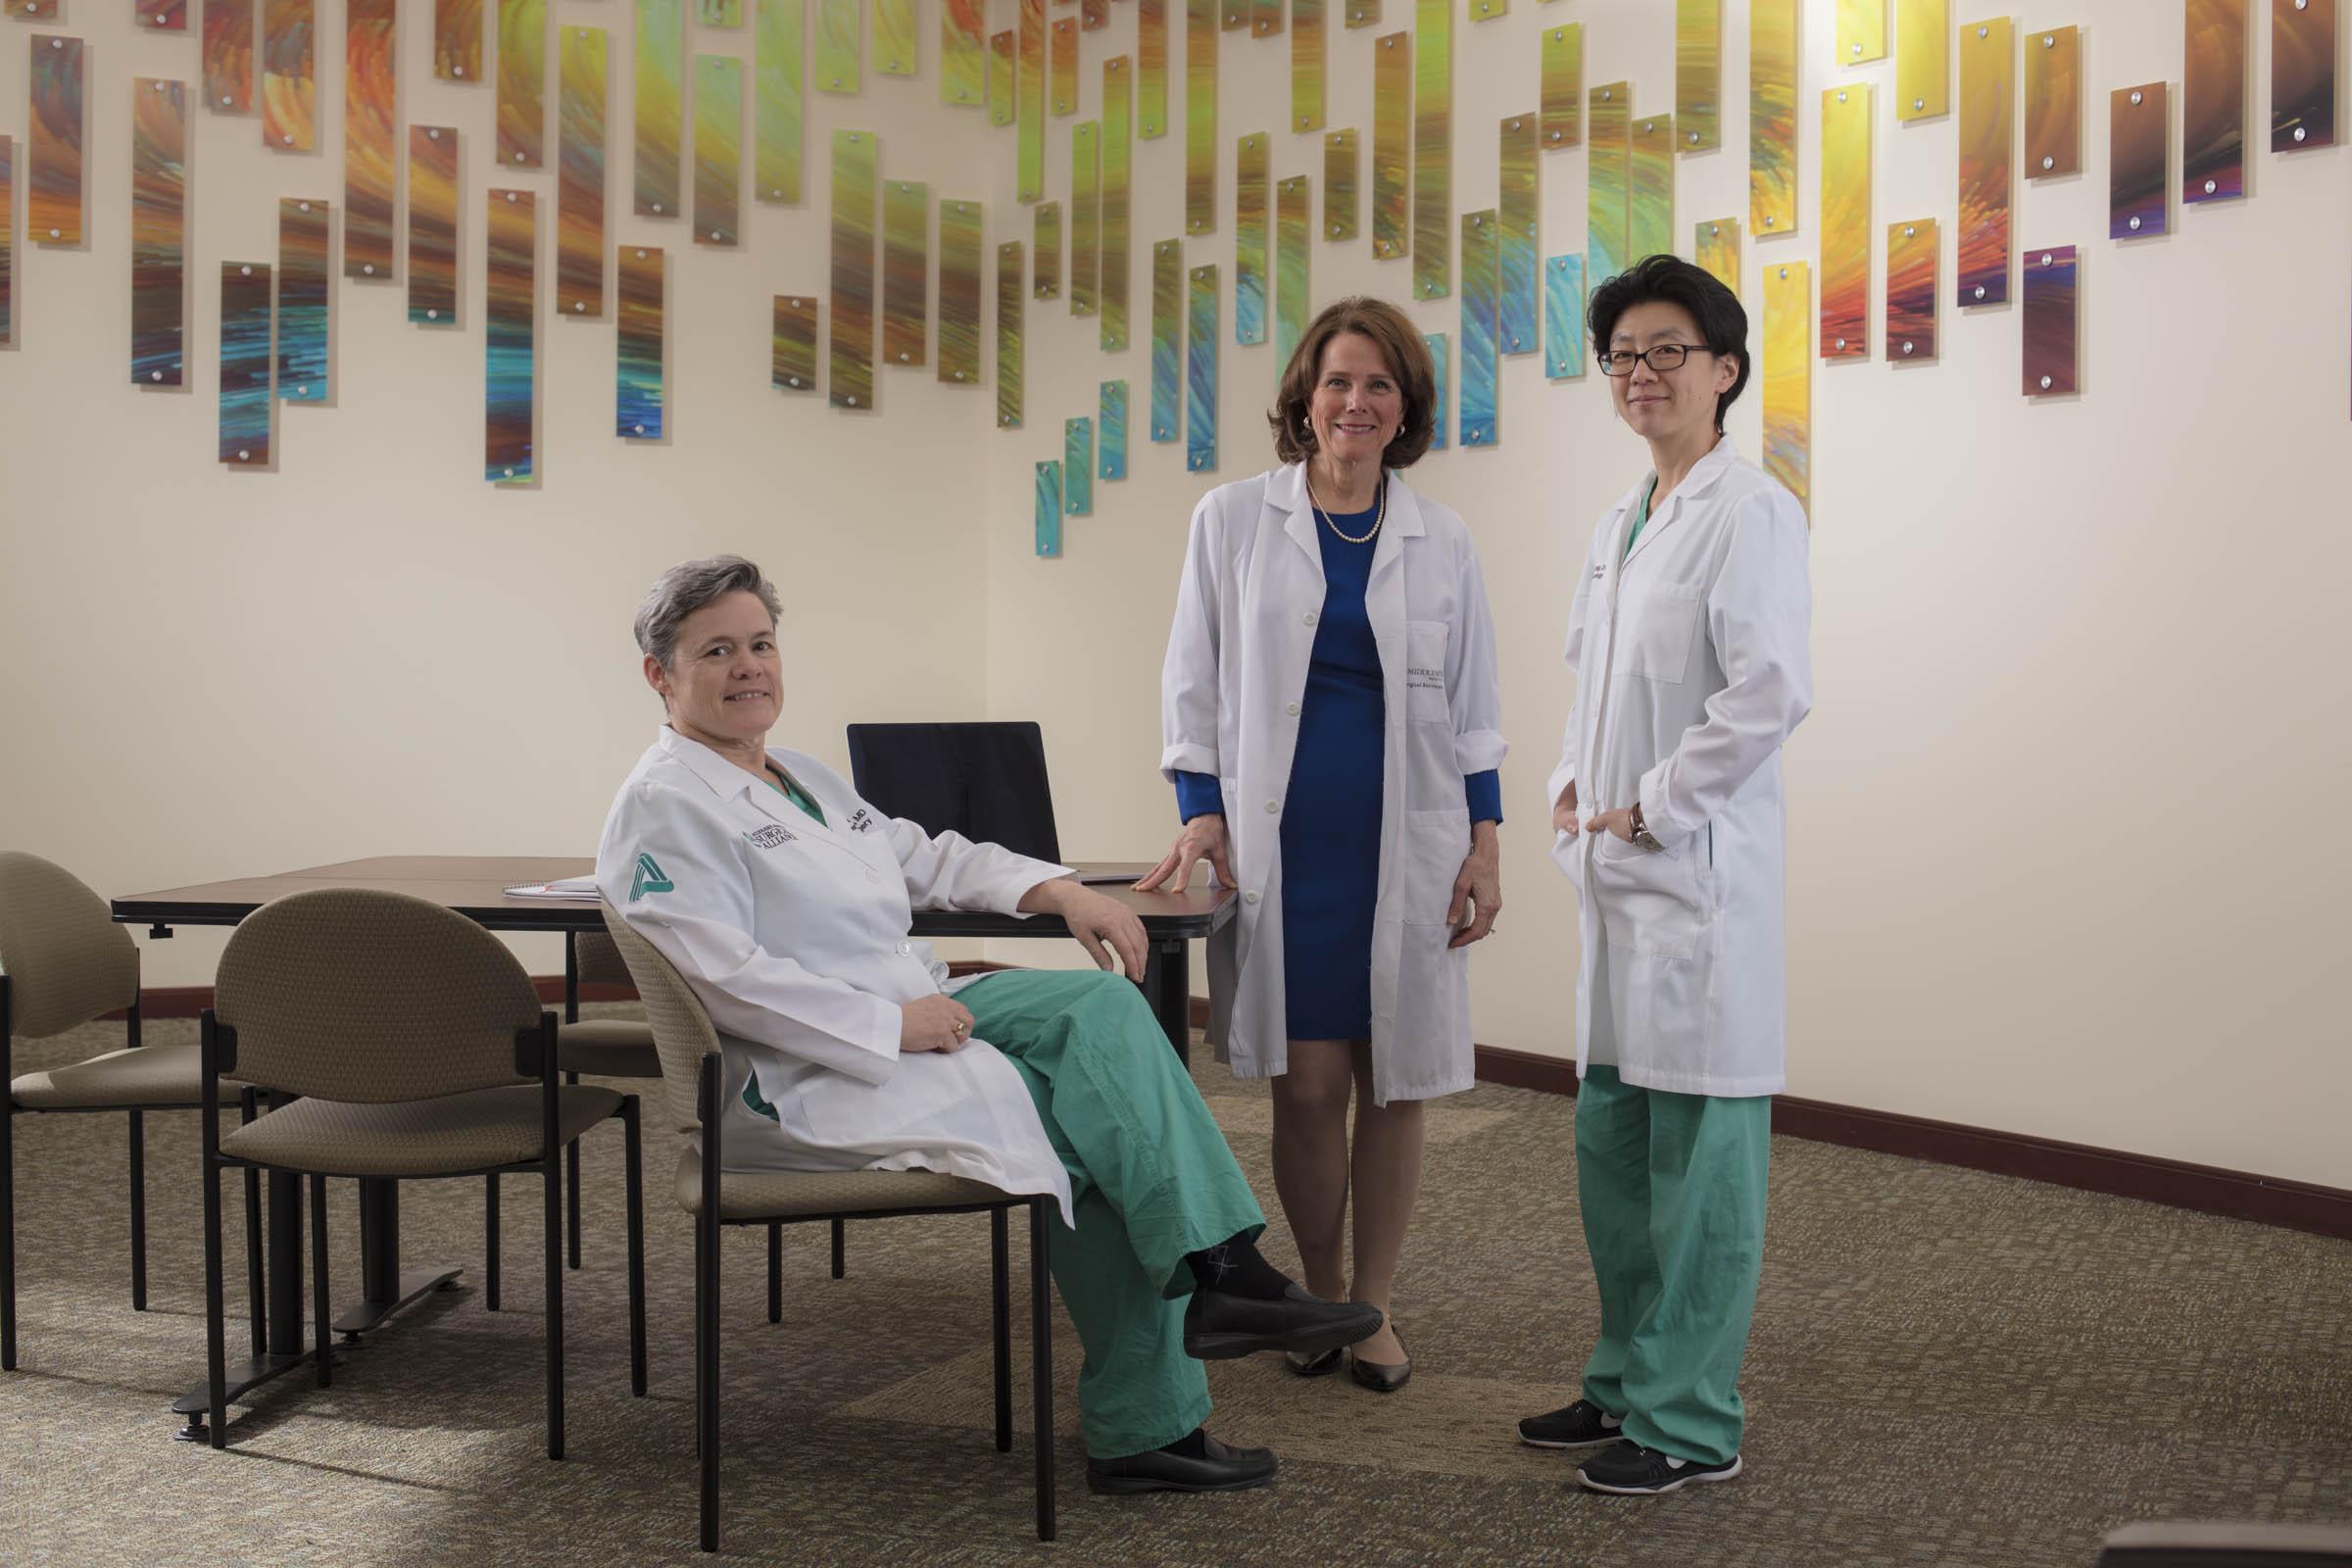 MDSX CCTR Surgeons -1046.jpg